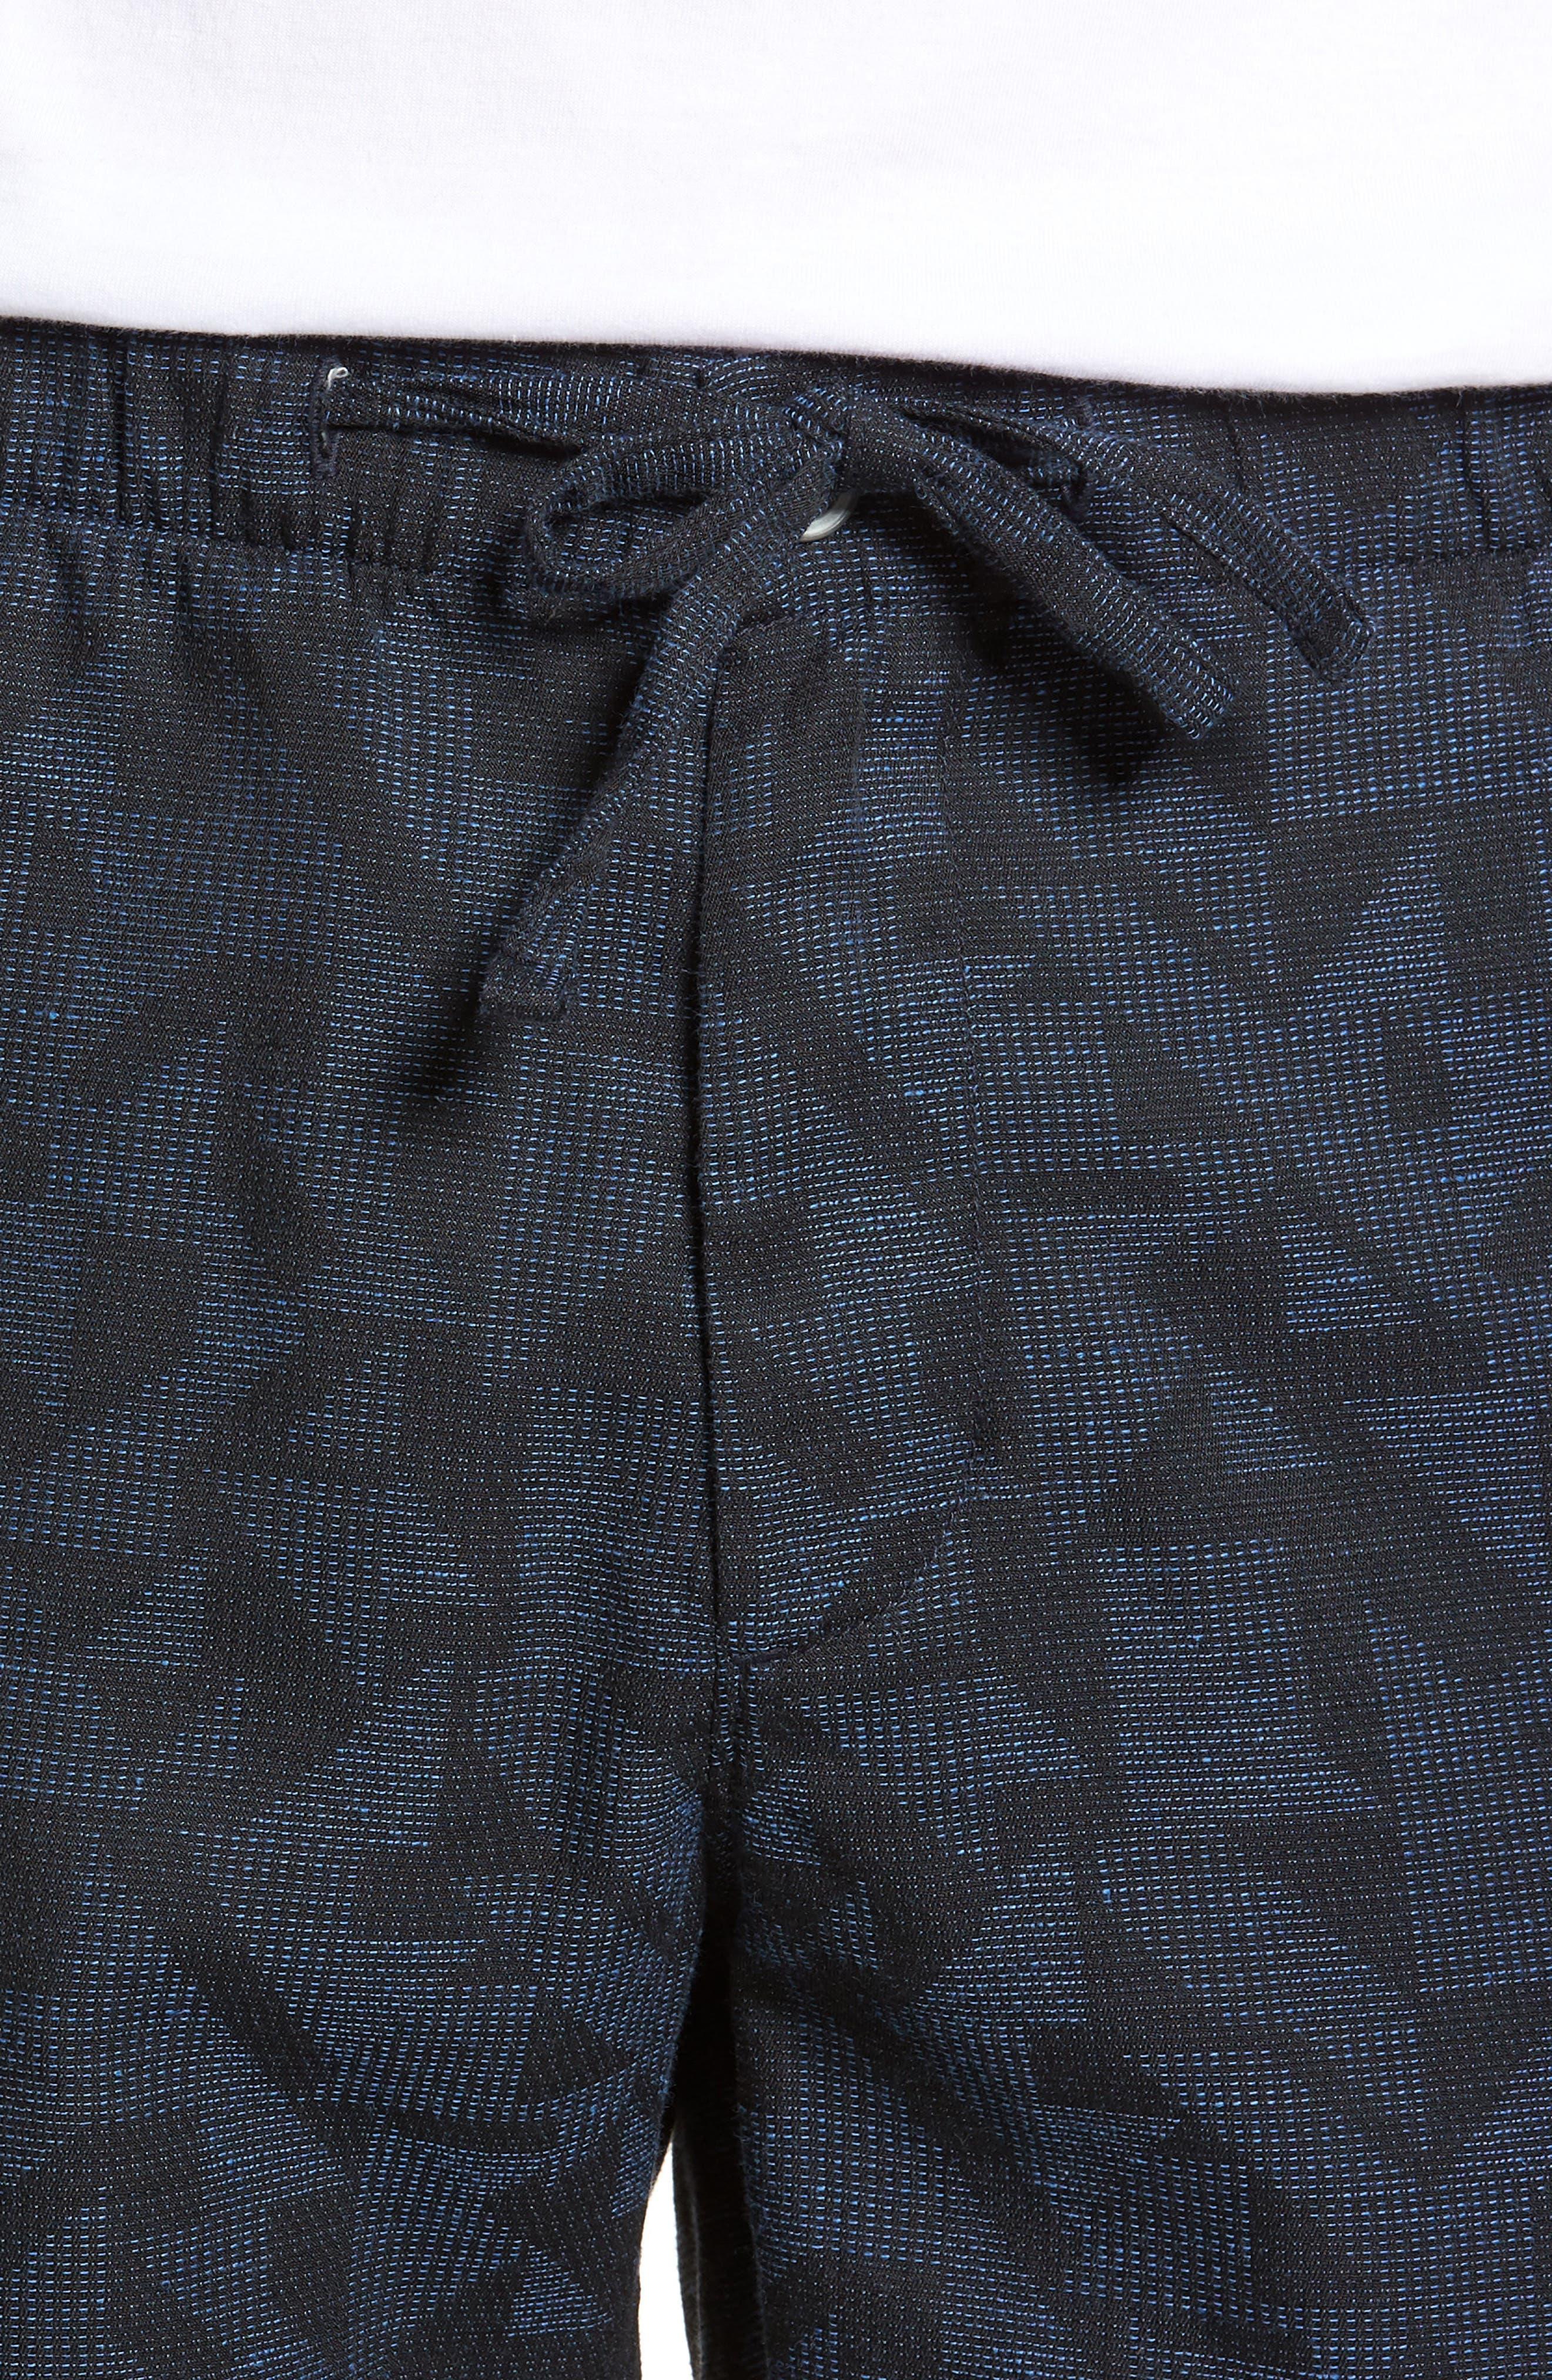 Print Beach Shorts,                             Alternate thumbnail 4, color,                             Navy Triangle Jacquard